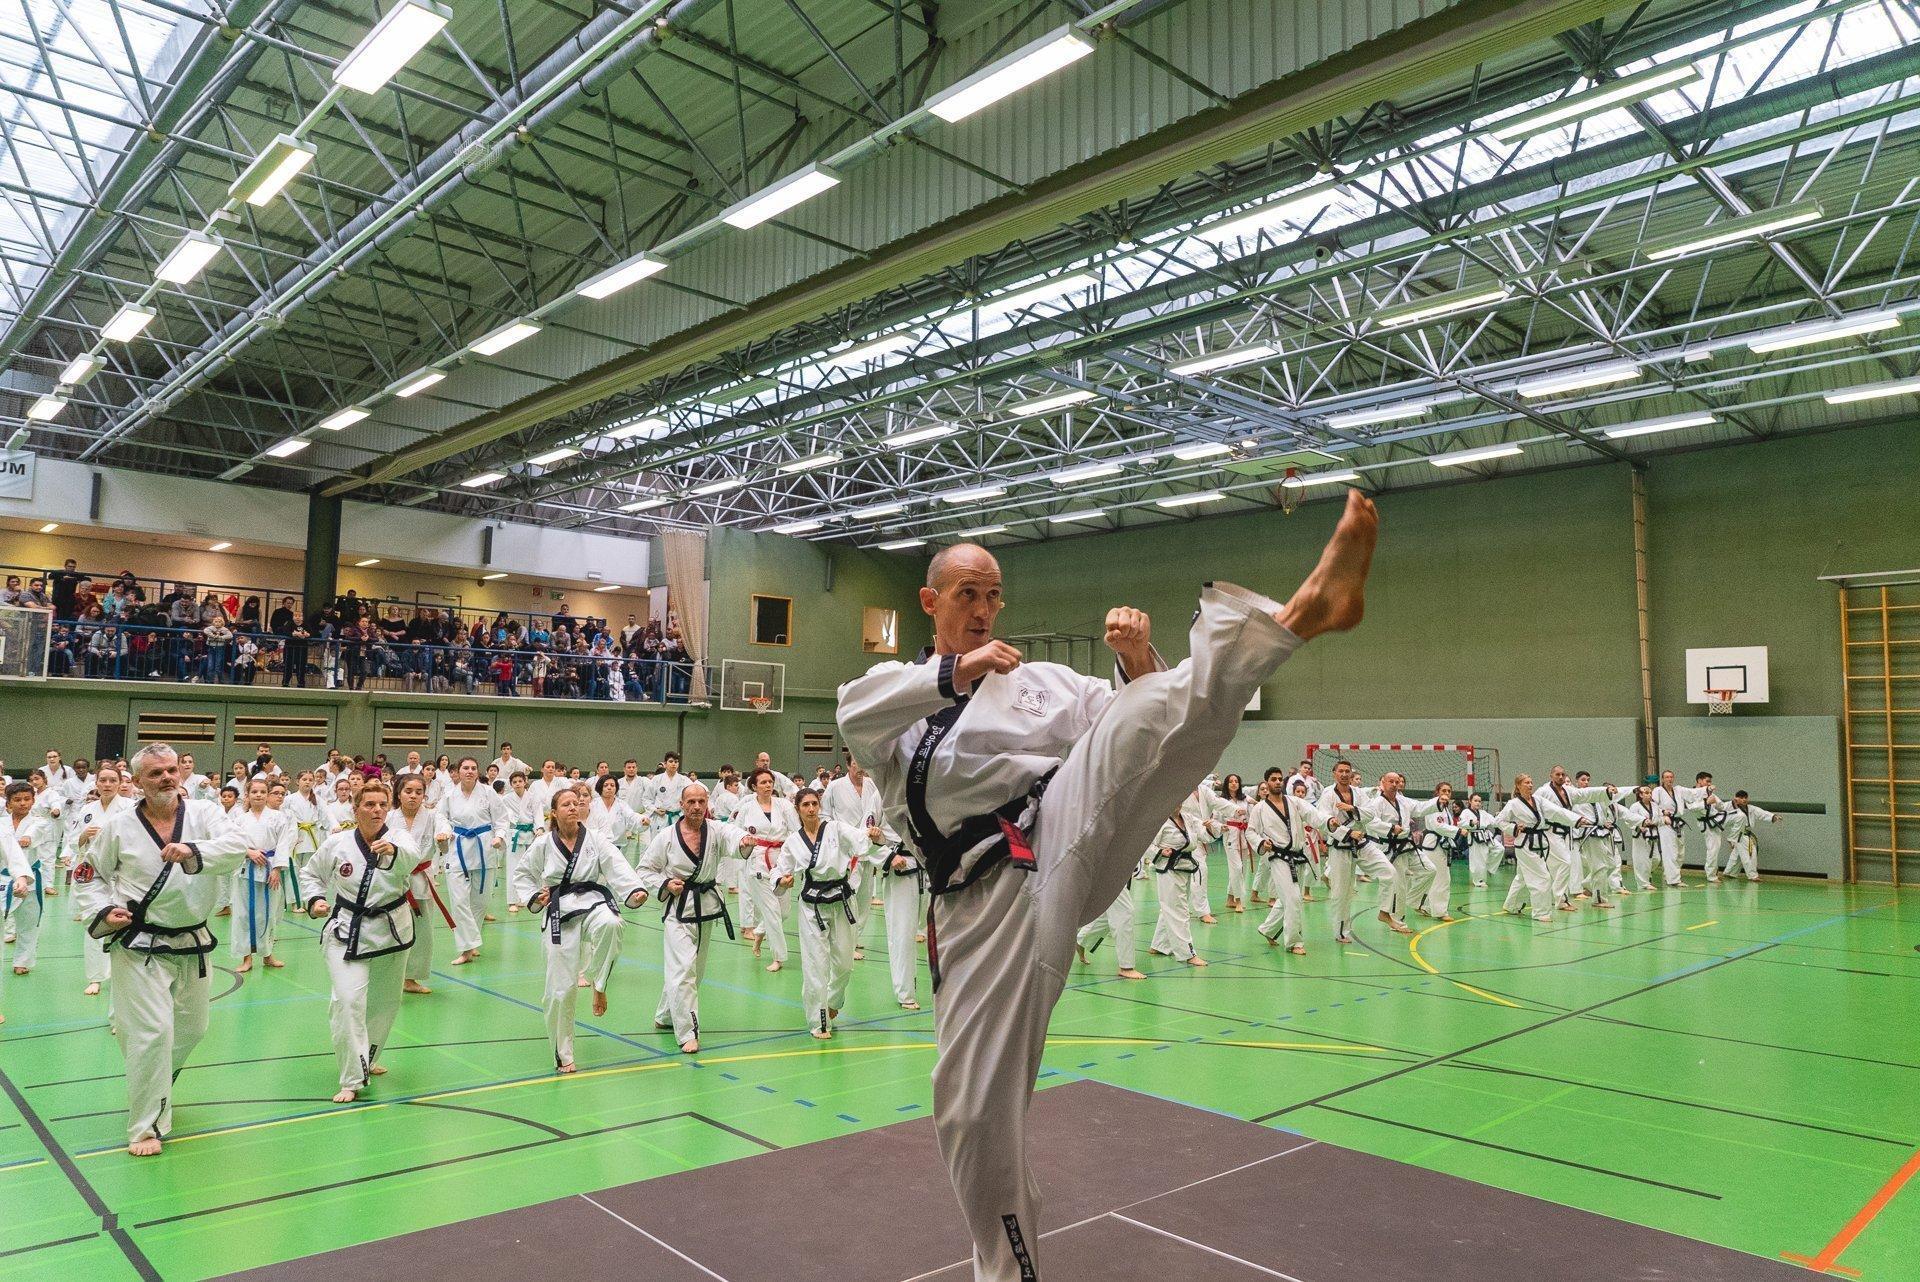 YOUNG-UNG Taekwondo Kampfsport Training Weihnachtslehrgang Schulschiff